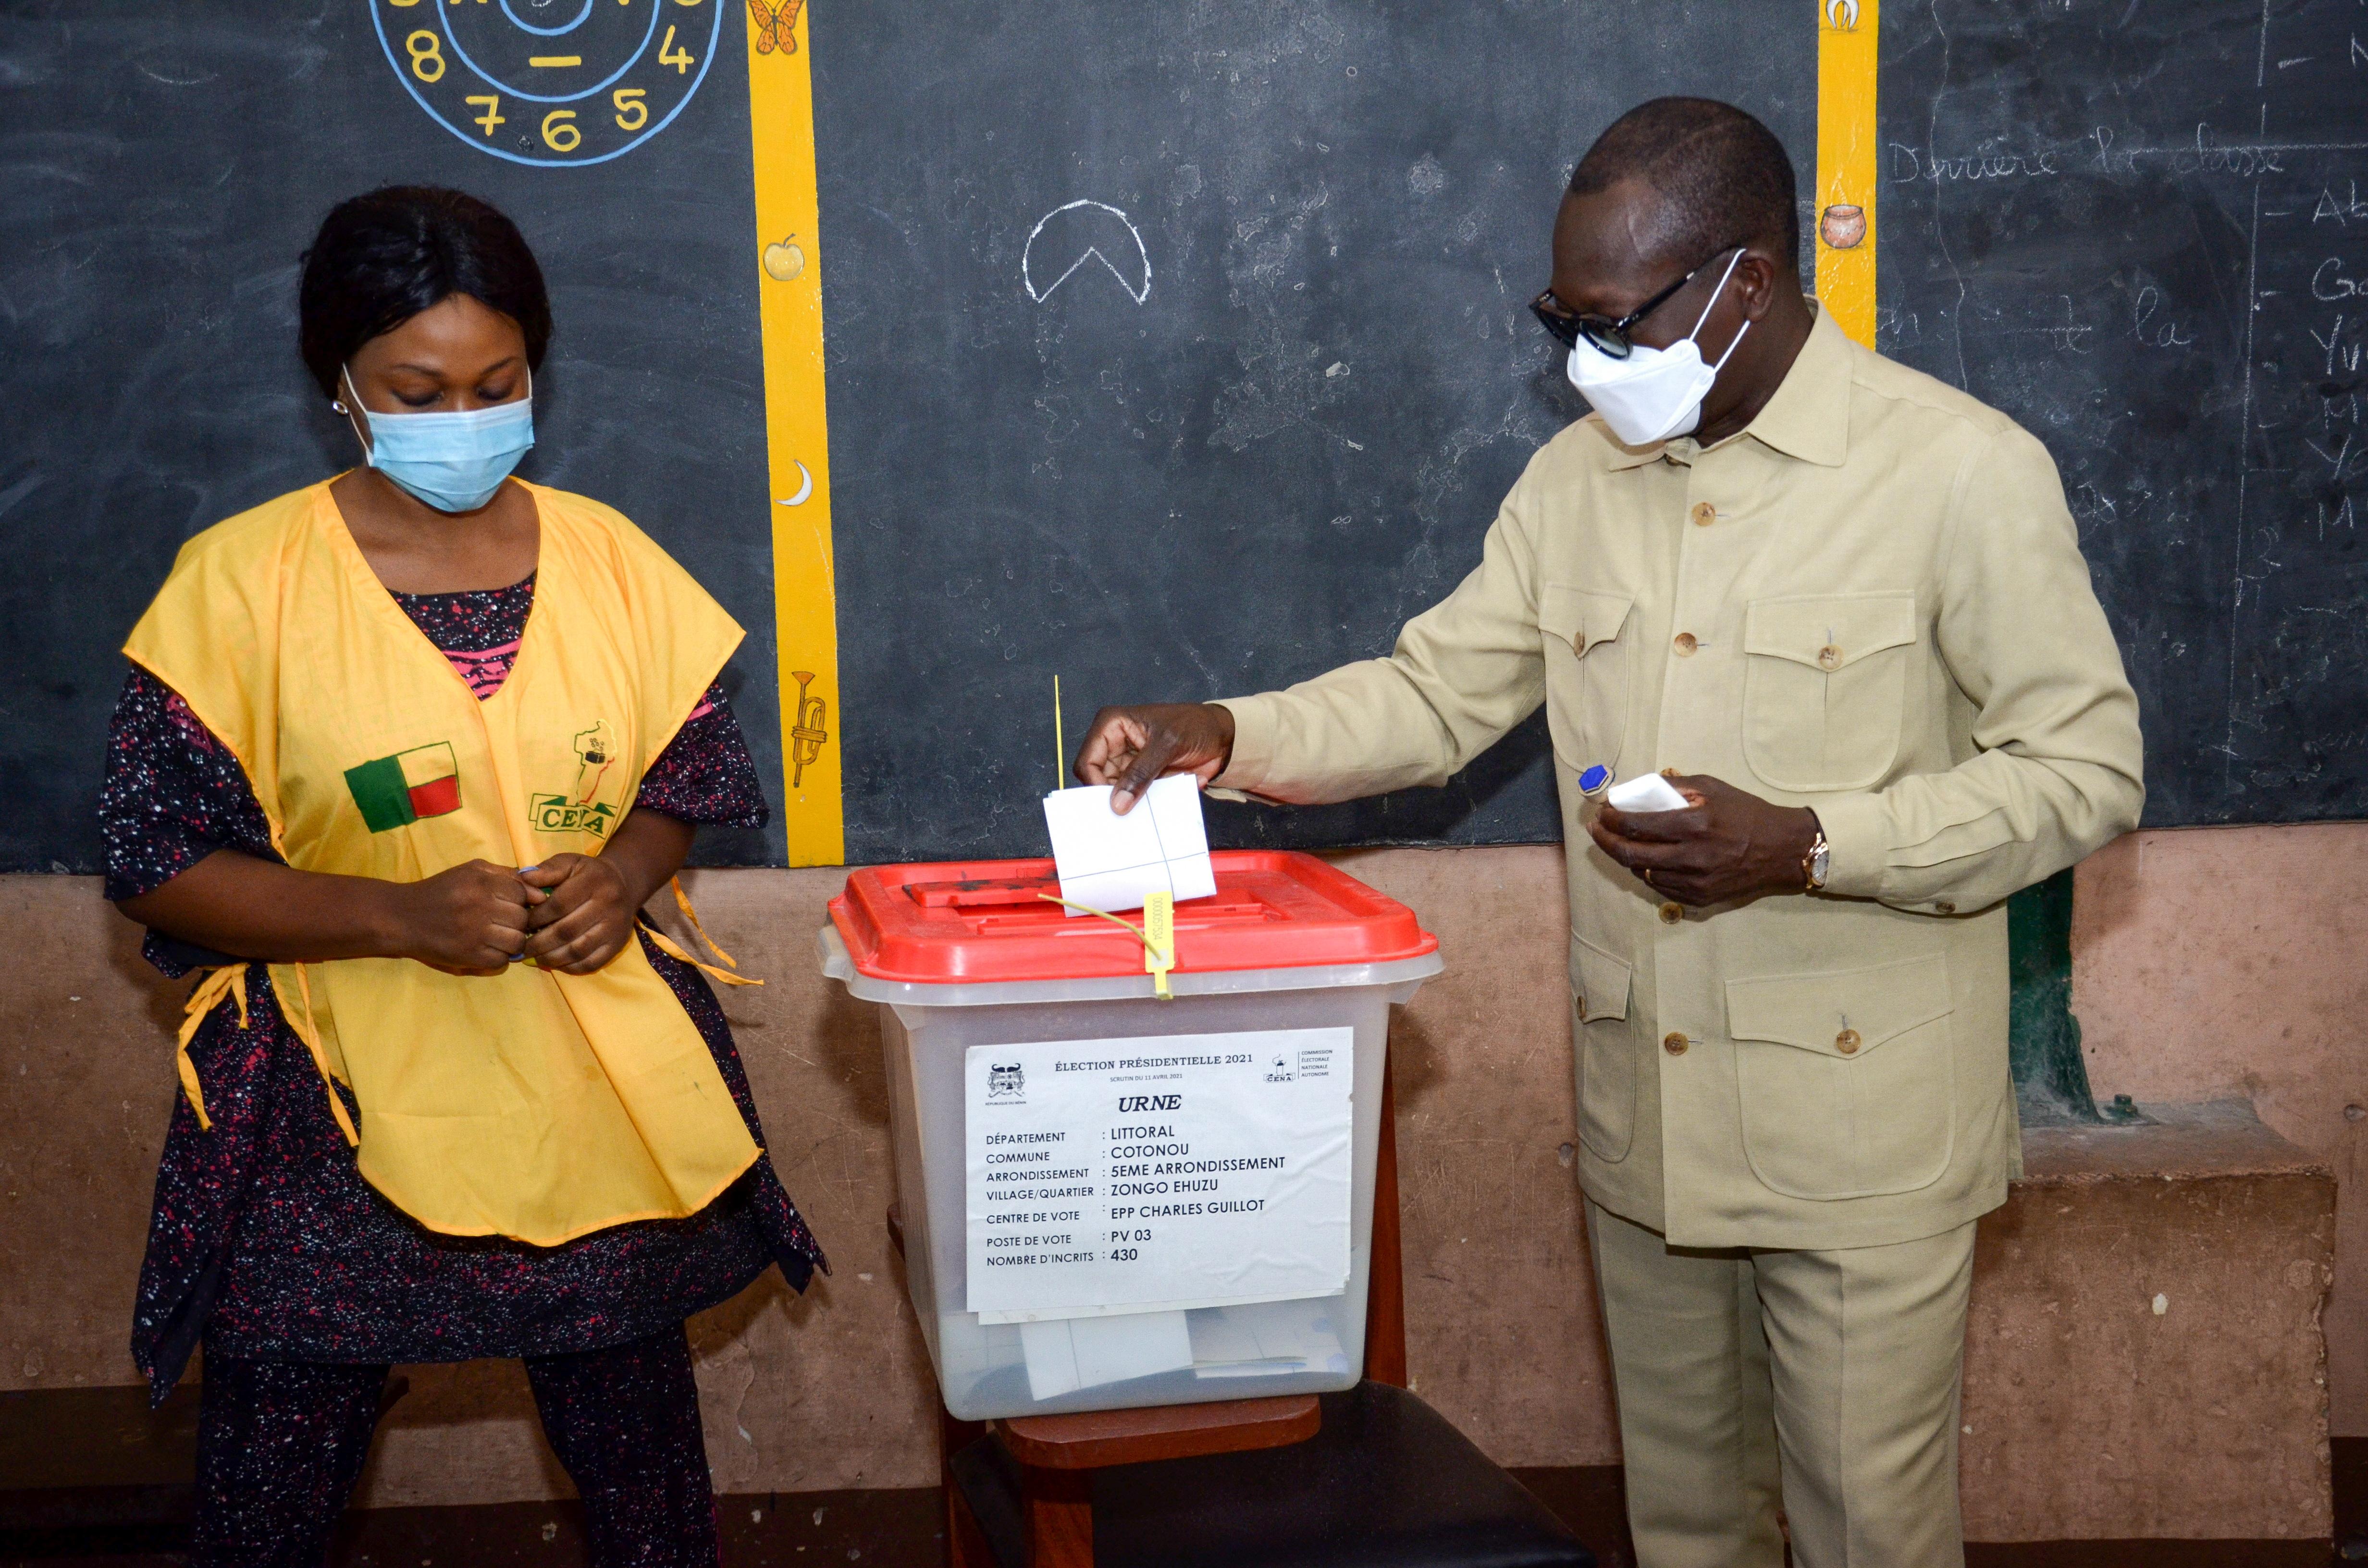 Benin's president Patrice Talon casts his ballot at a polling station in Cotonou, Benin April 11, 2021. REUTERS/Charle Placide Tossou